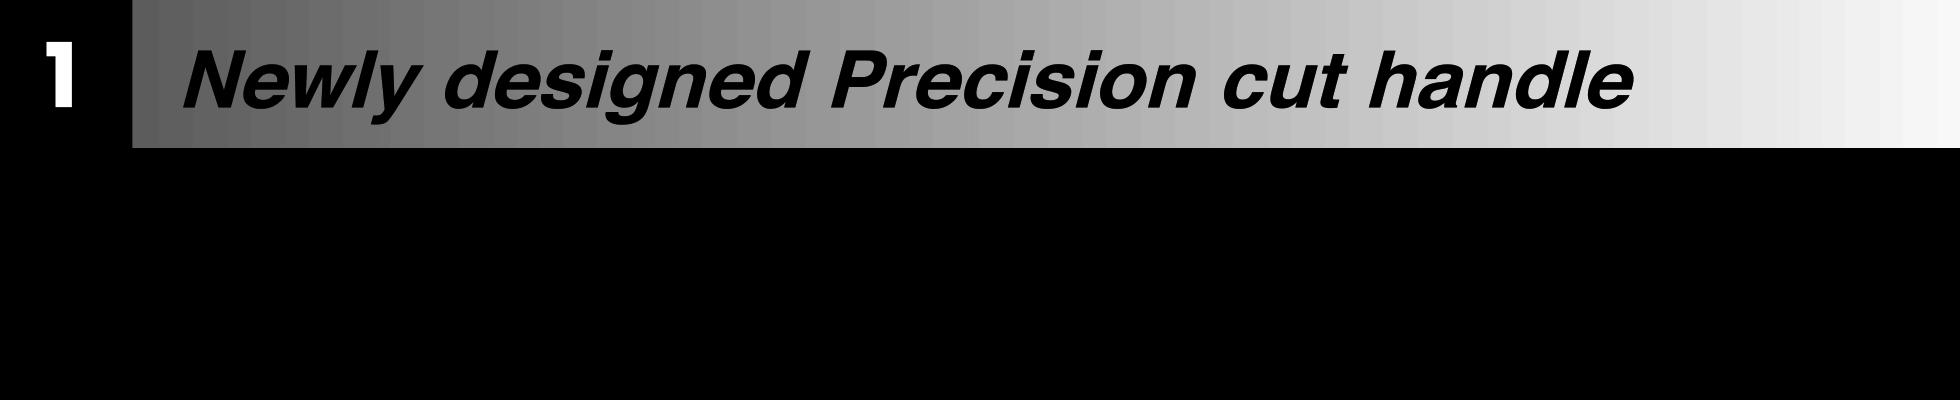 Newly designed Precision cut handle